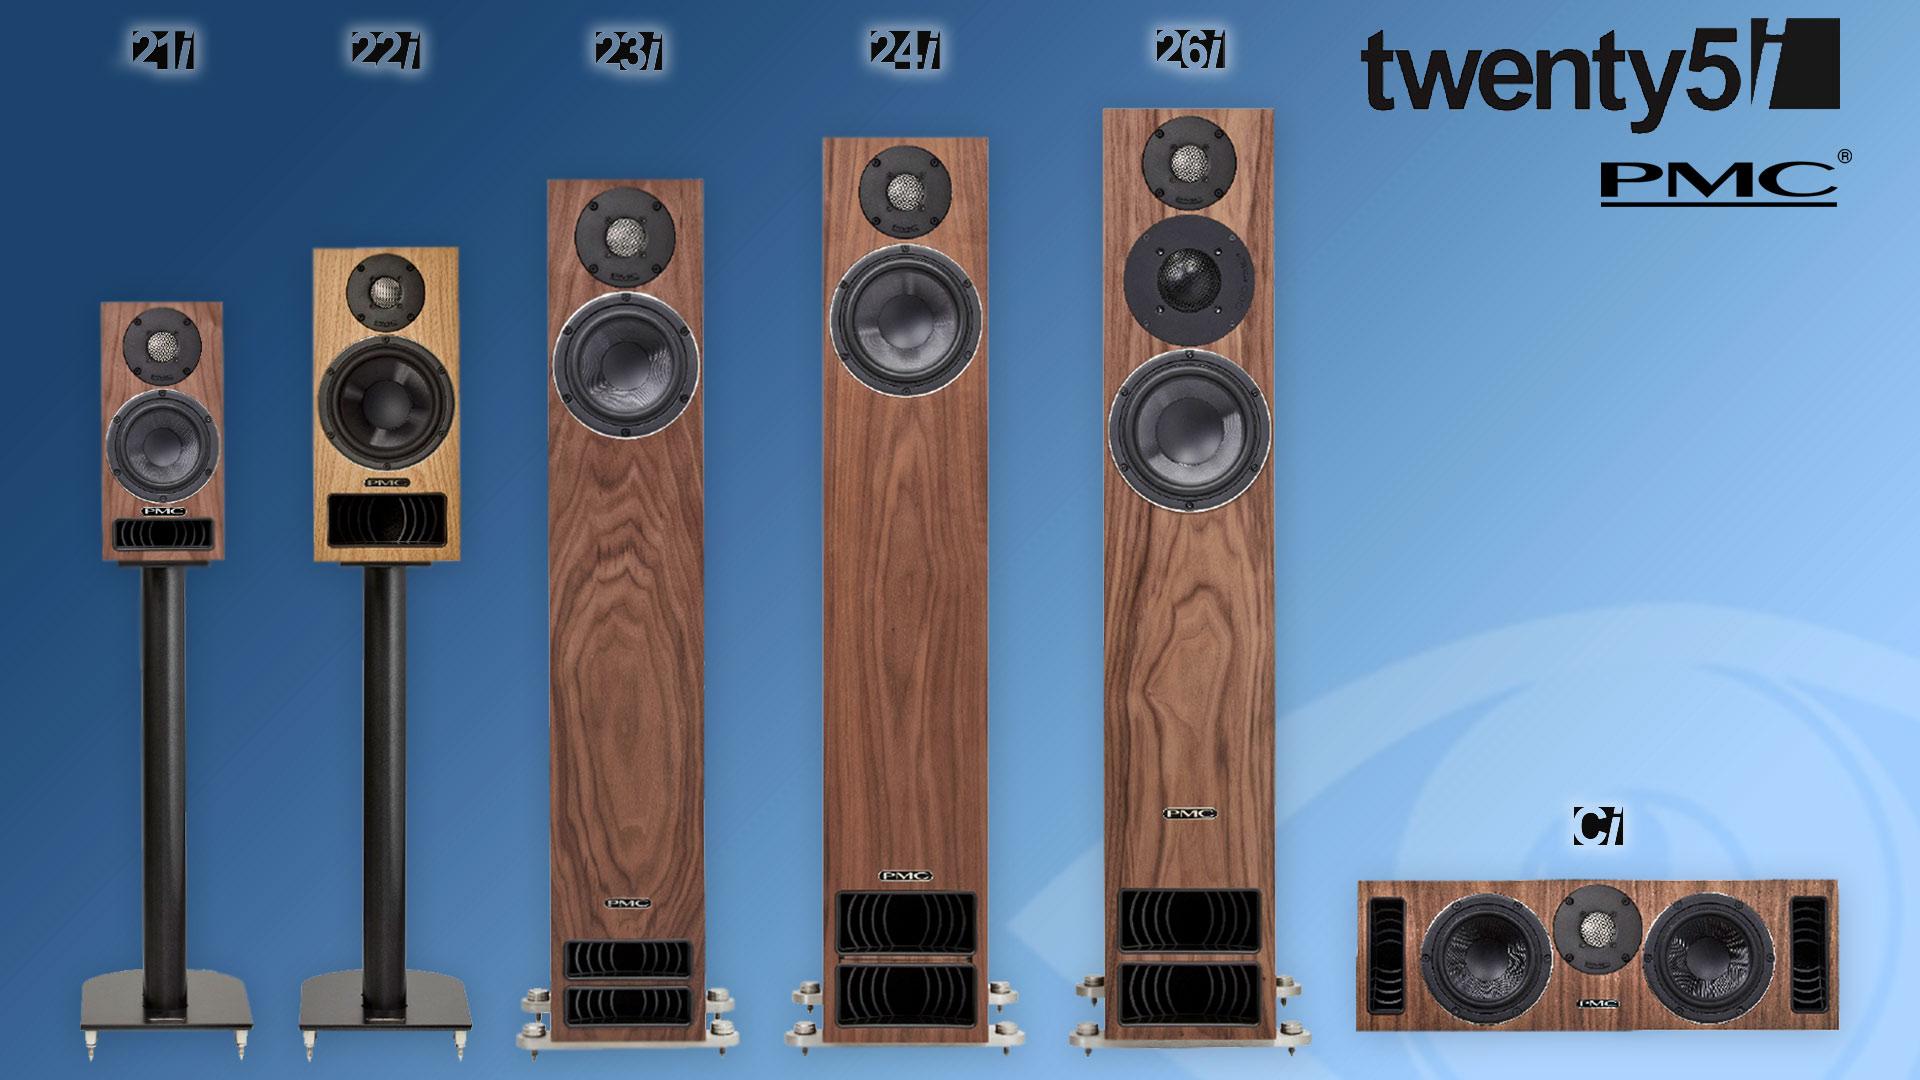 PMC Twenty5i Loudspeakers Range | Unilet Sound & Vision